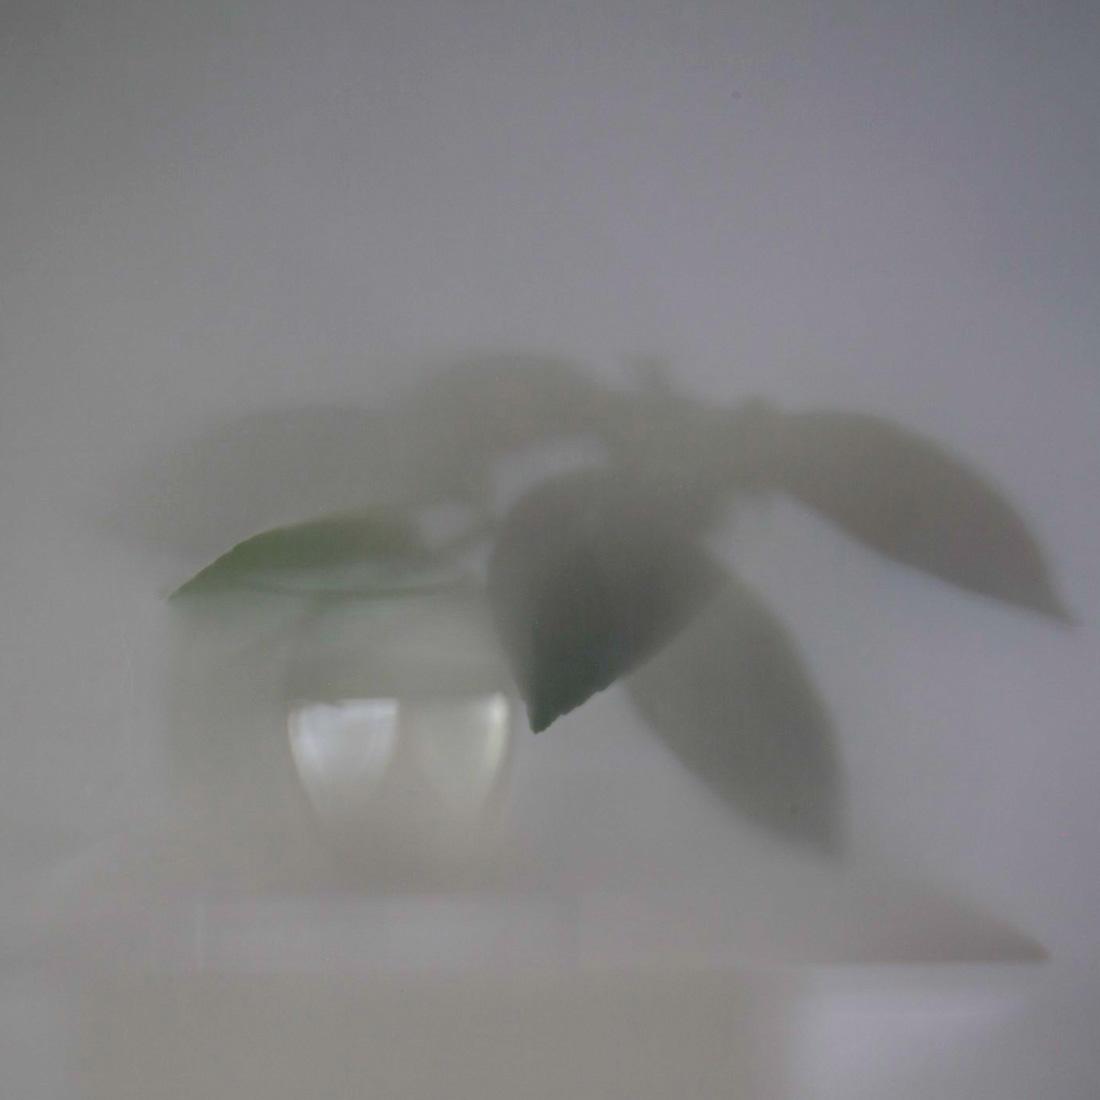 Shadows-Lemontree-010-2012-17